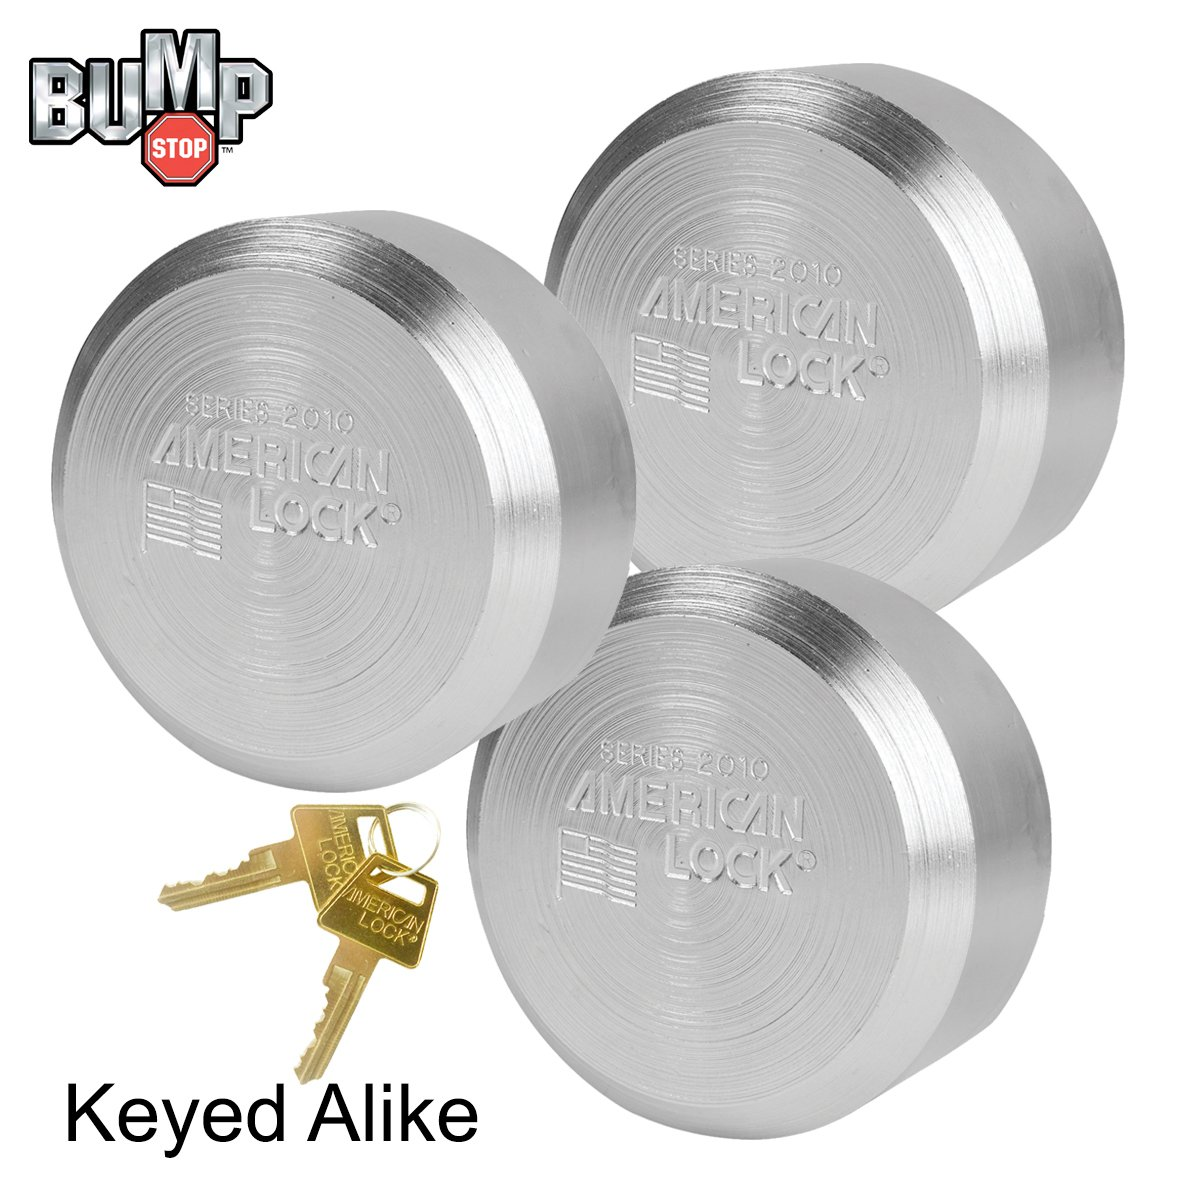 American / Master Lock - (3) Solid Steel, High Security, Hidden Shackle Padlocks, w/ Bumpstop Technology A2010NKA-3